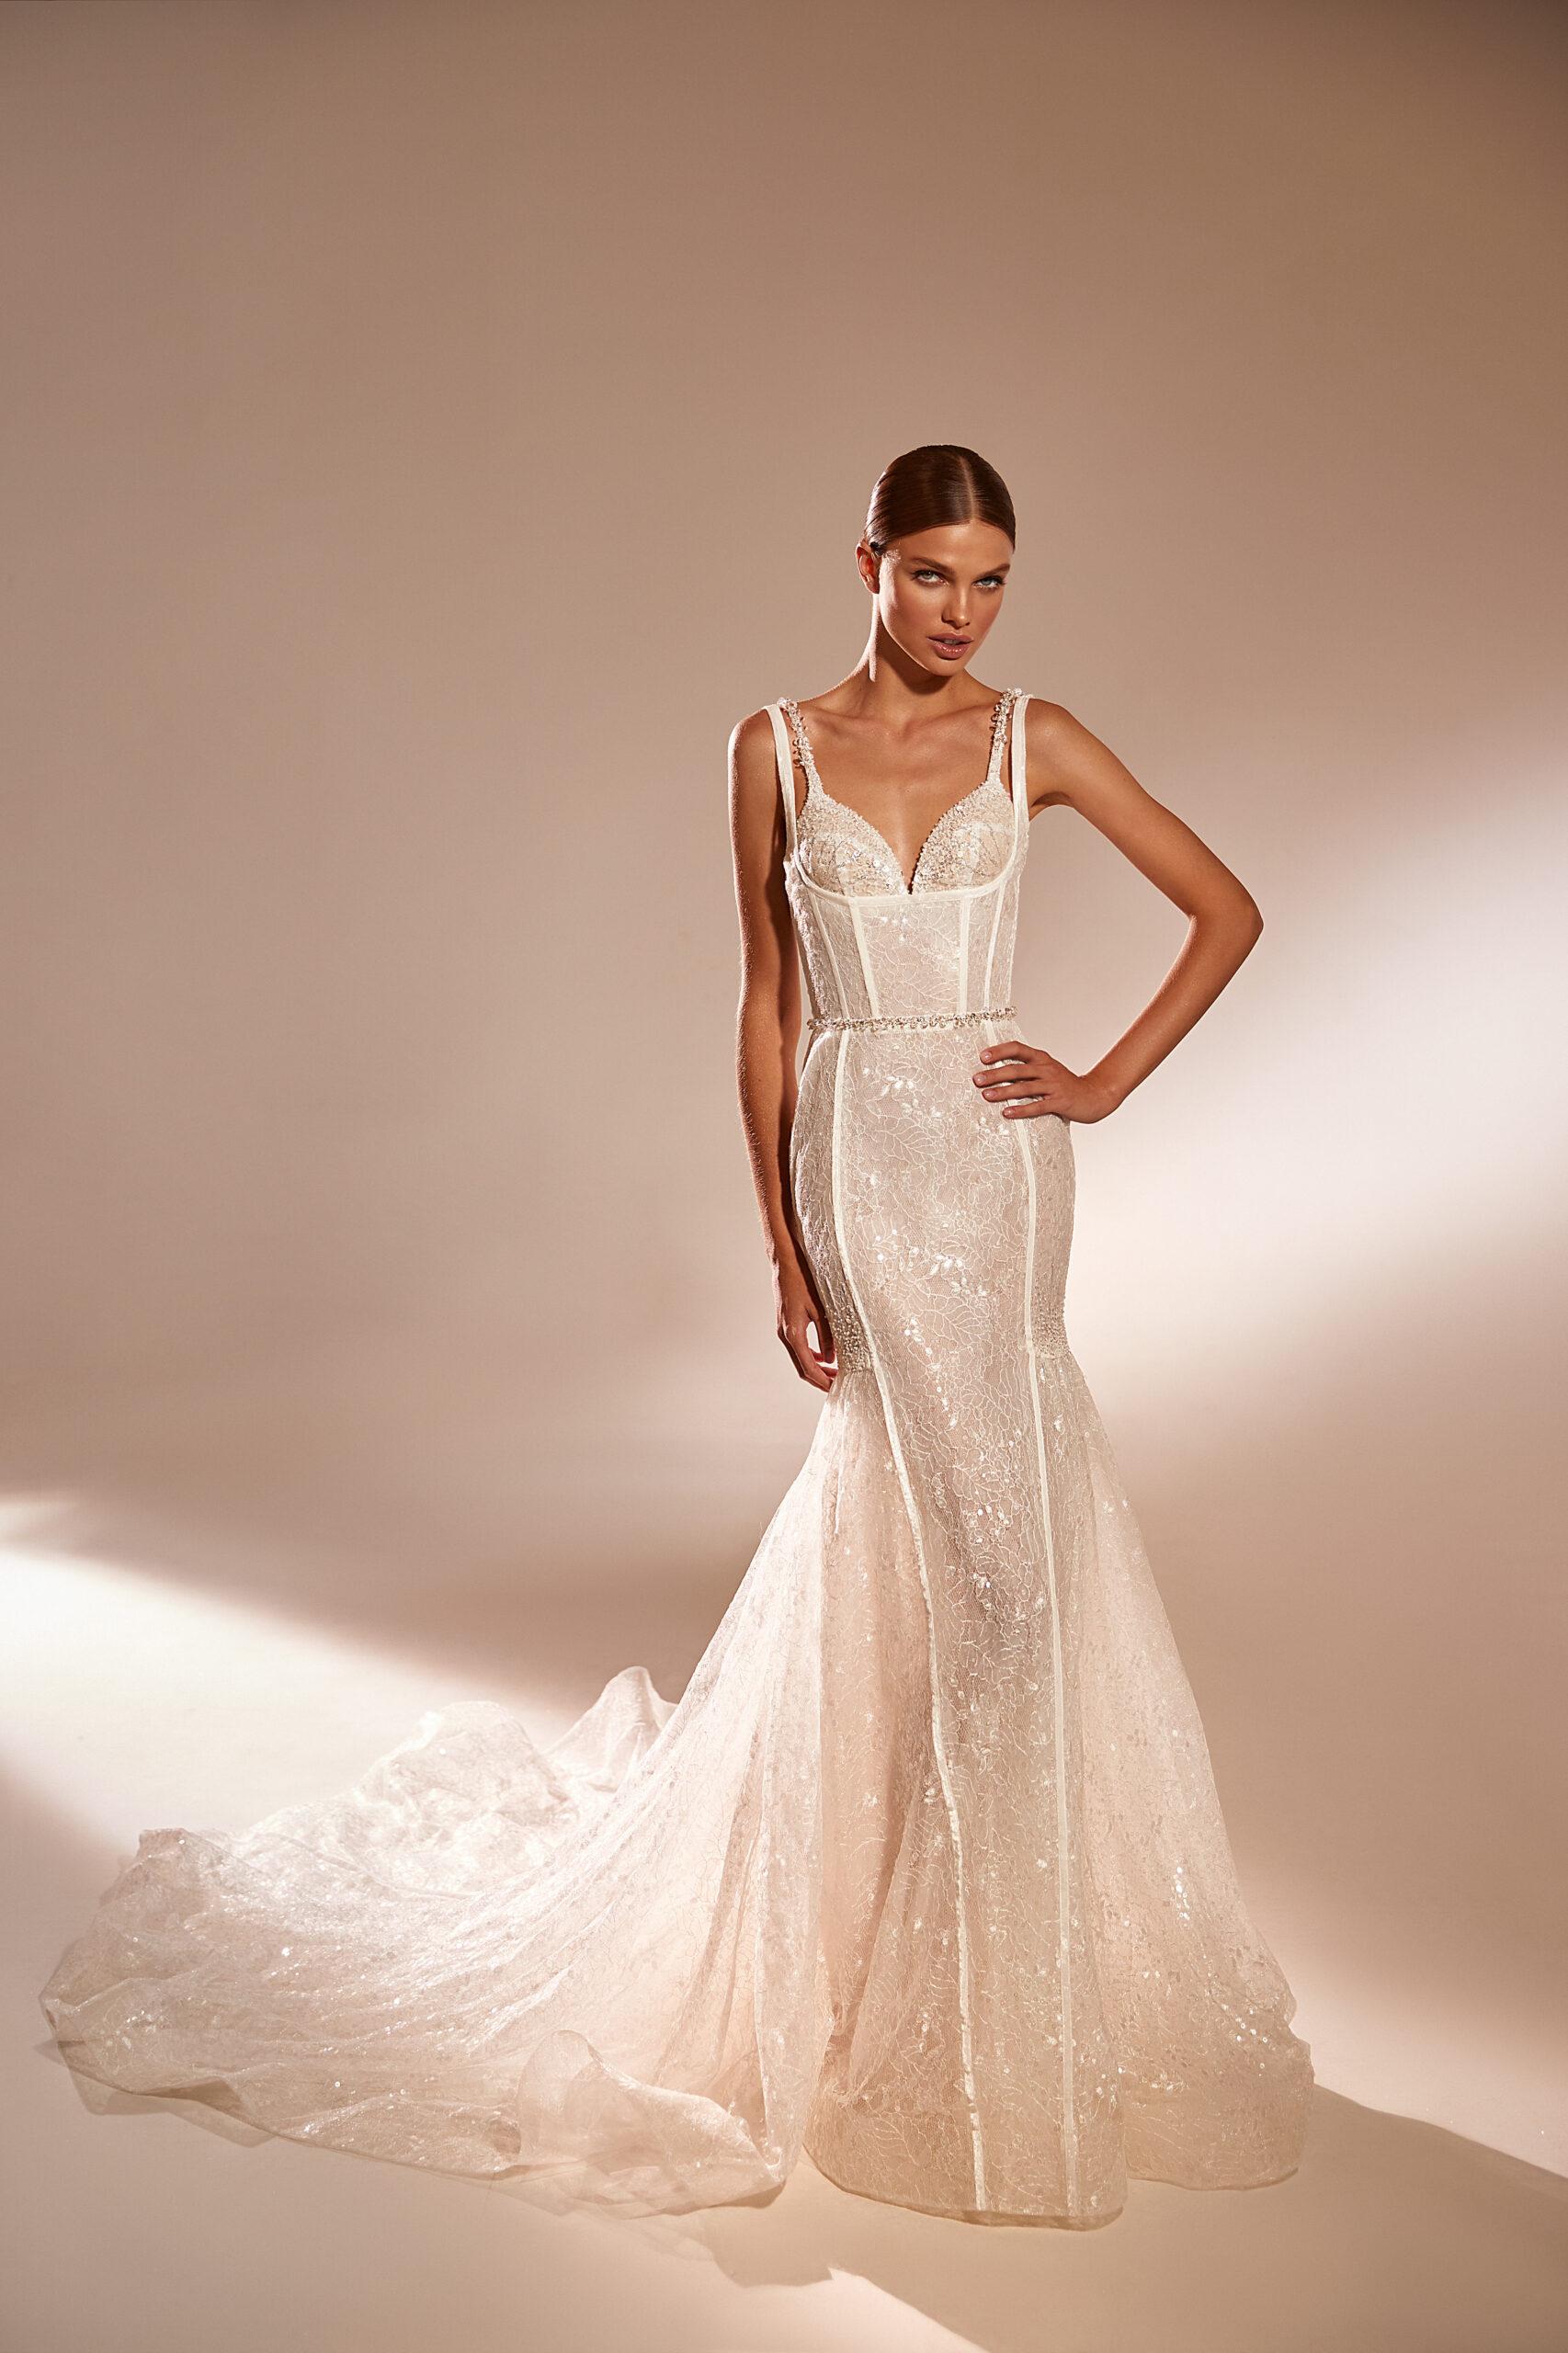 Milla Nova, In the name of love, Blushing Bridal Boutique, Toronto, Canada, USA